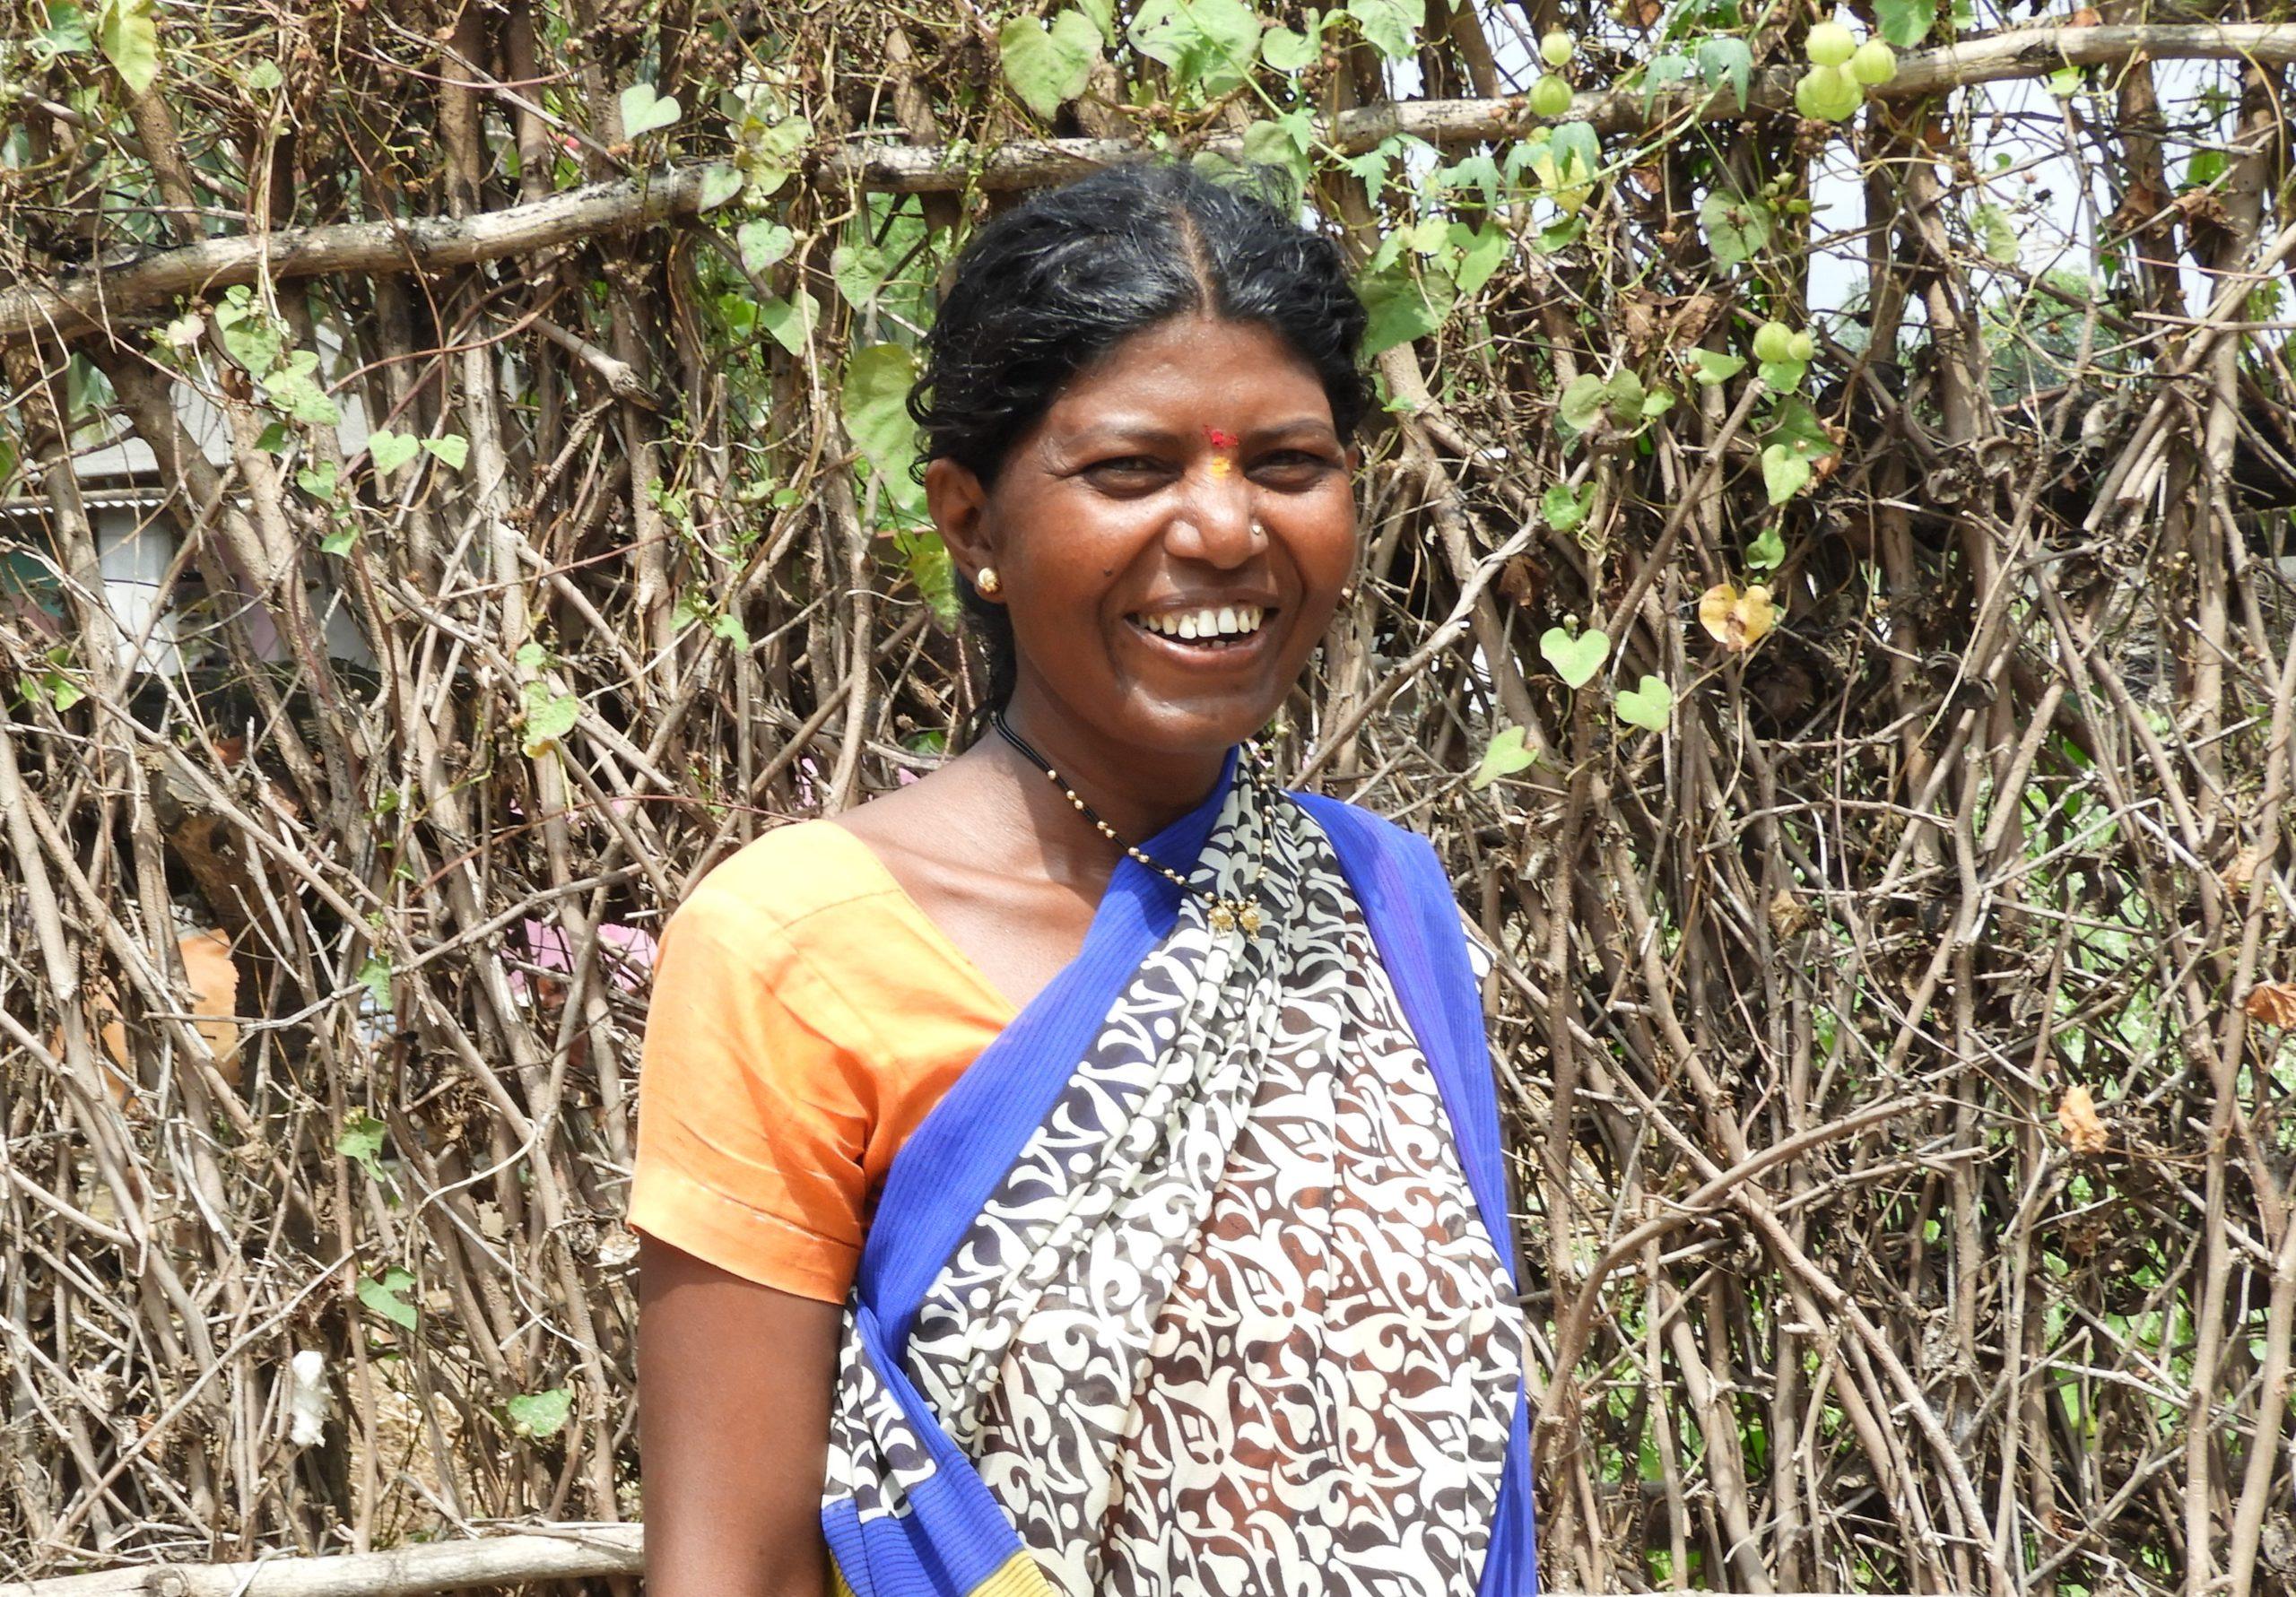 Meet Surekha: female farmer building her land